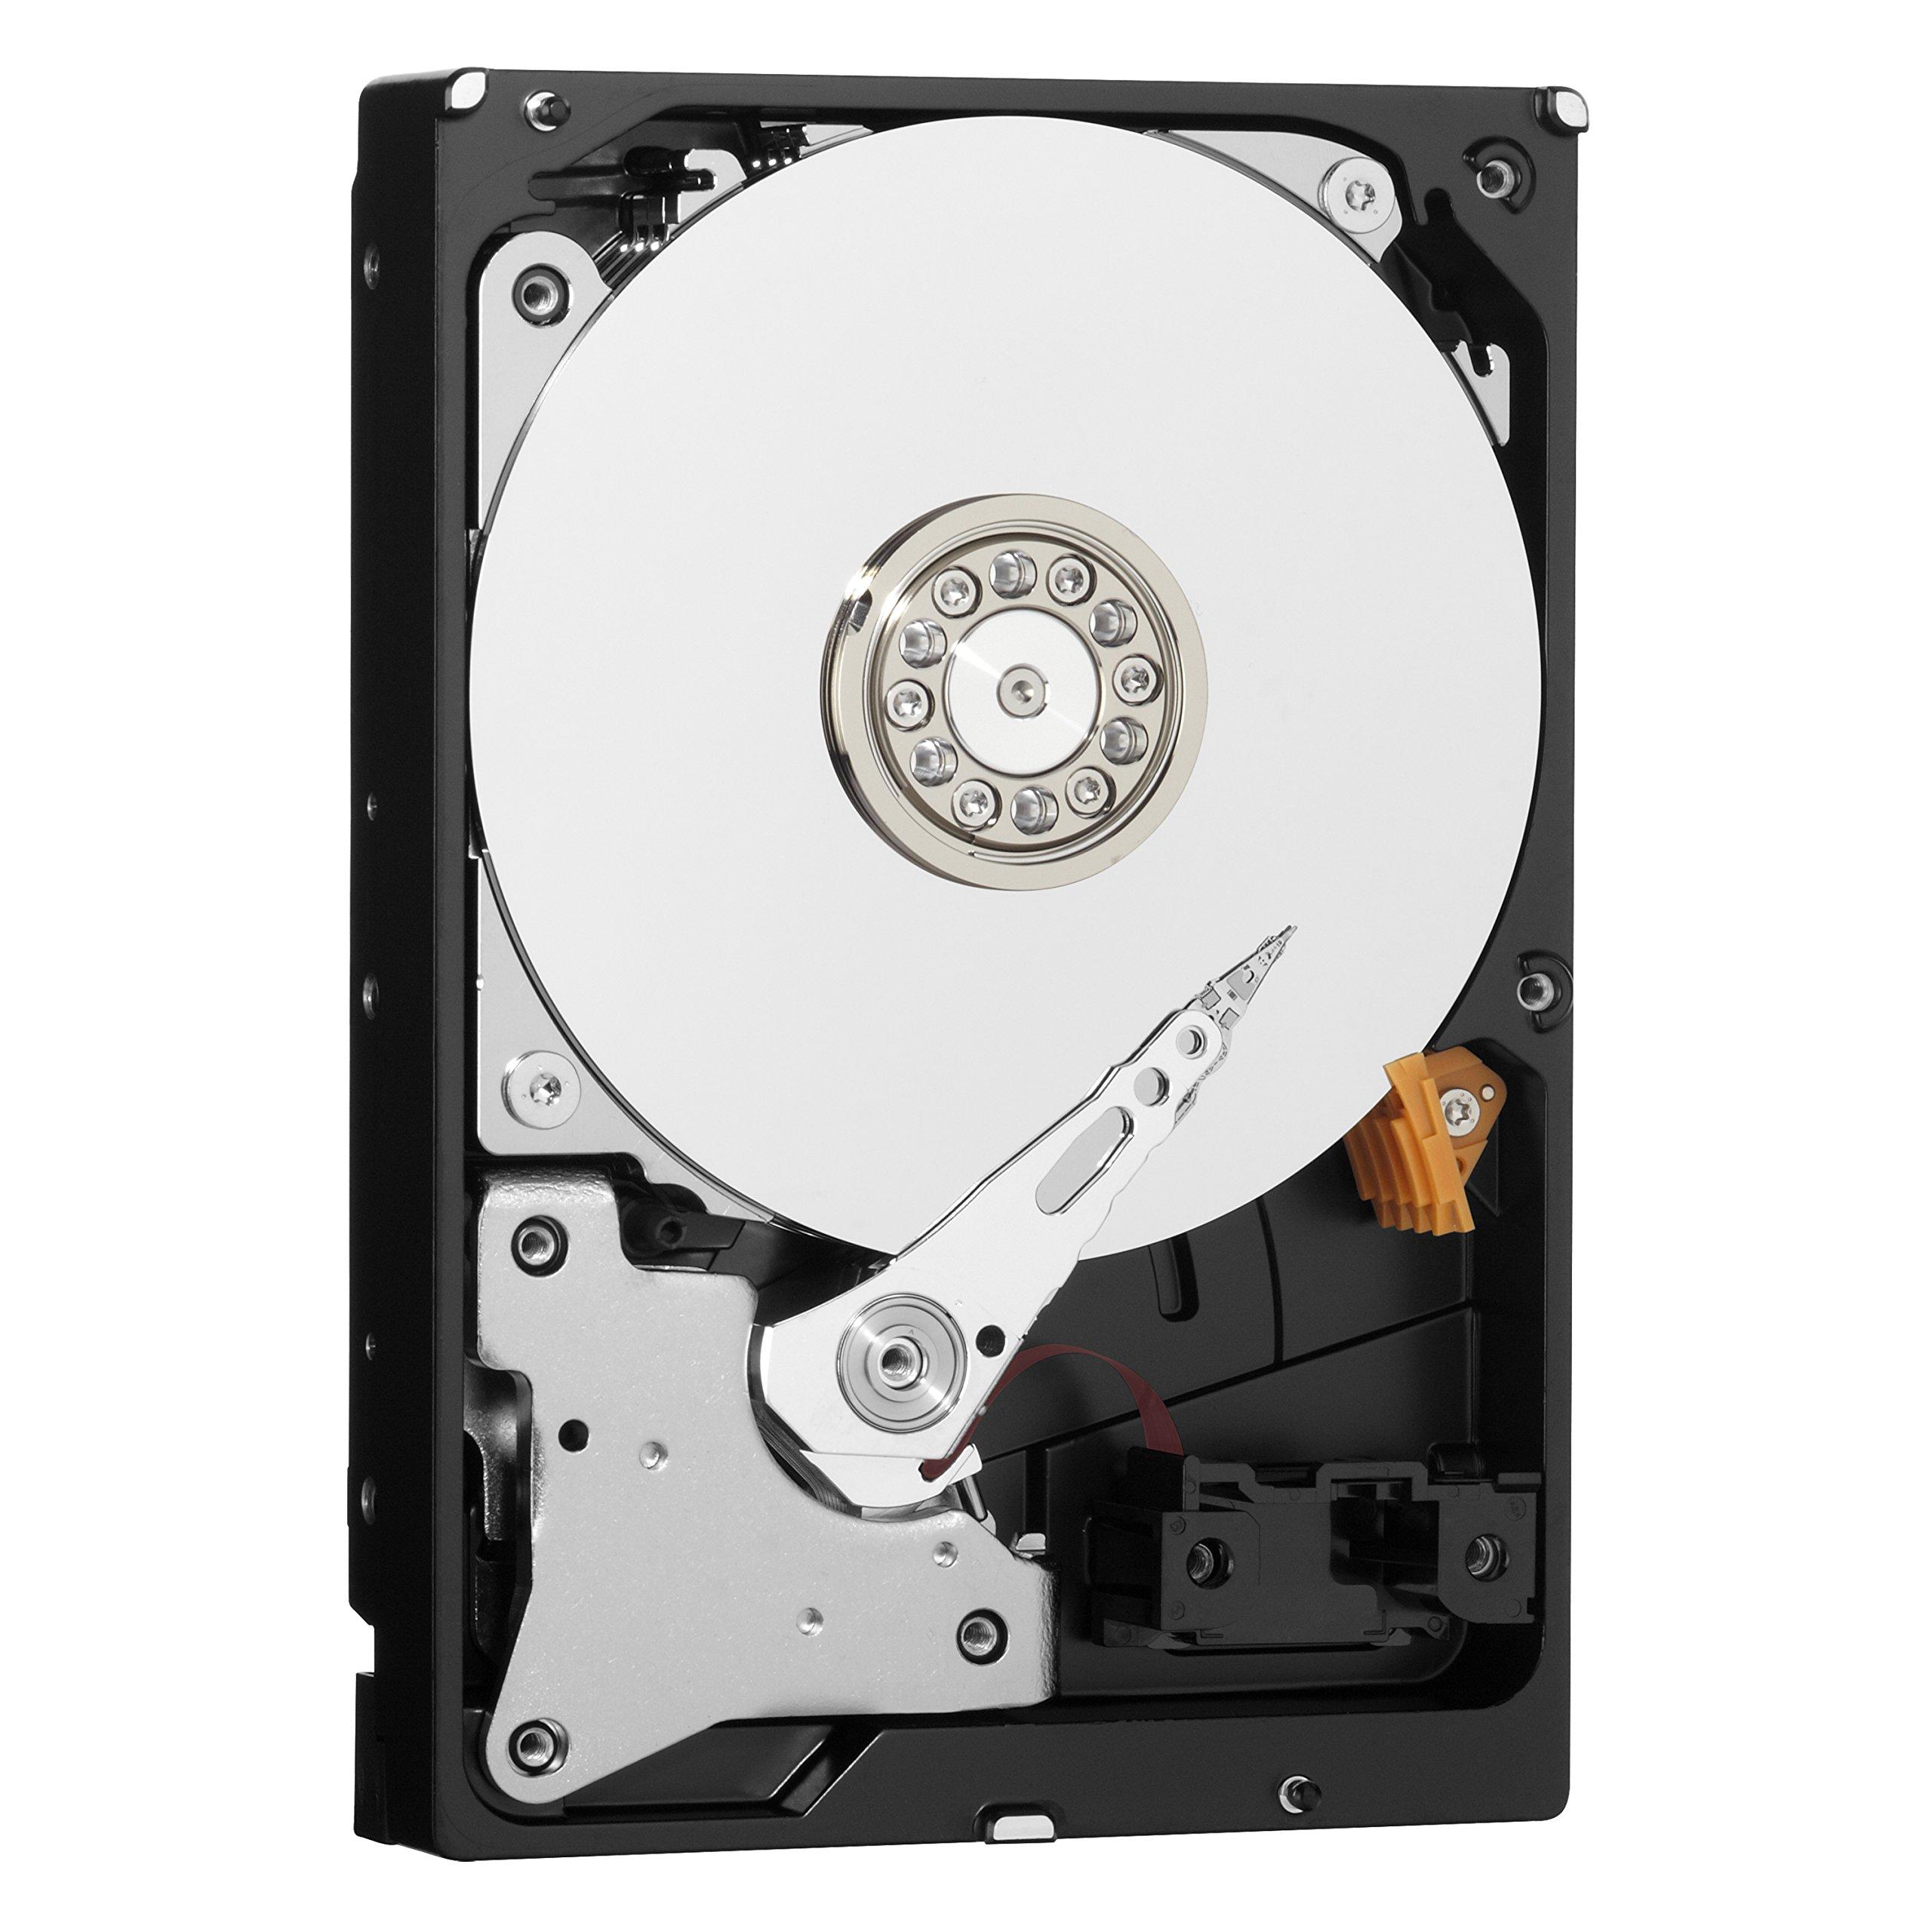 WD Red Pro 4TB NAS Internal Hard Drive - 7200 RPM Class, SATA 6 Gb/s, 256 MB Cache, 3.5'' - WD4003FFBX by Western Digital (Image #7)